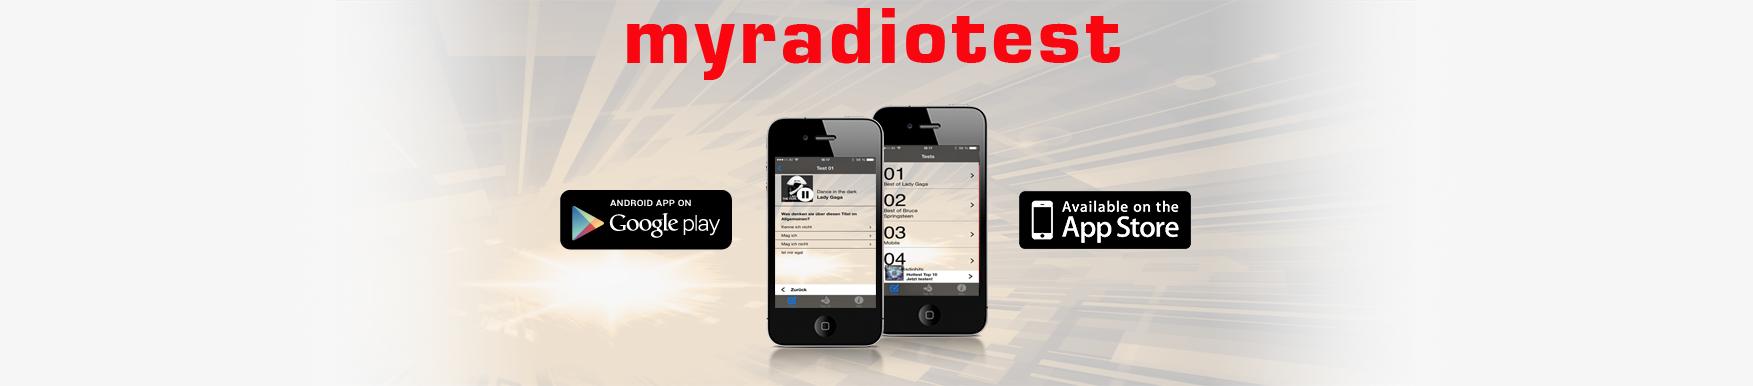 myradiotest-web-banner_mobi